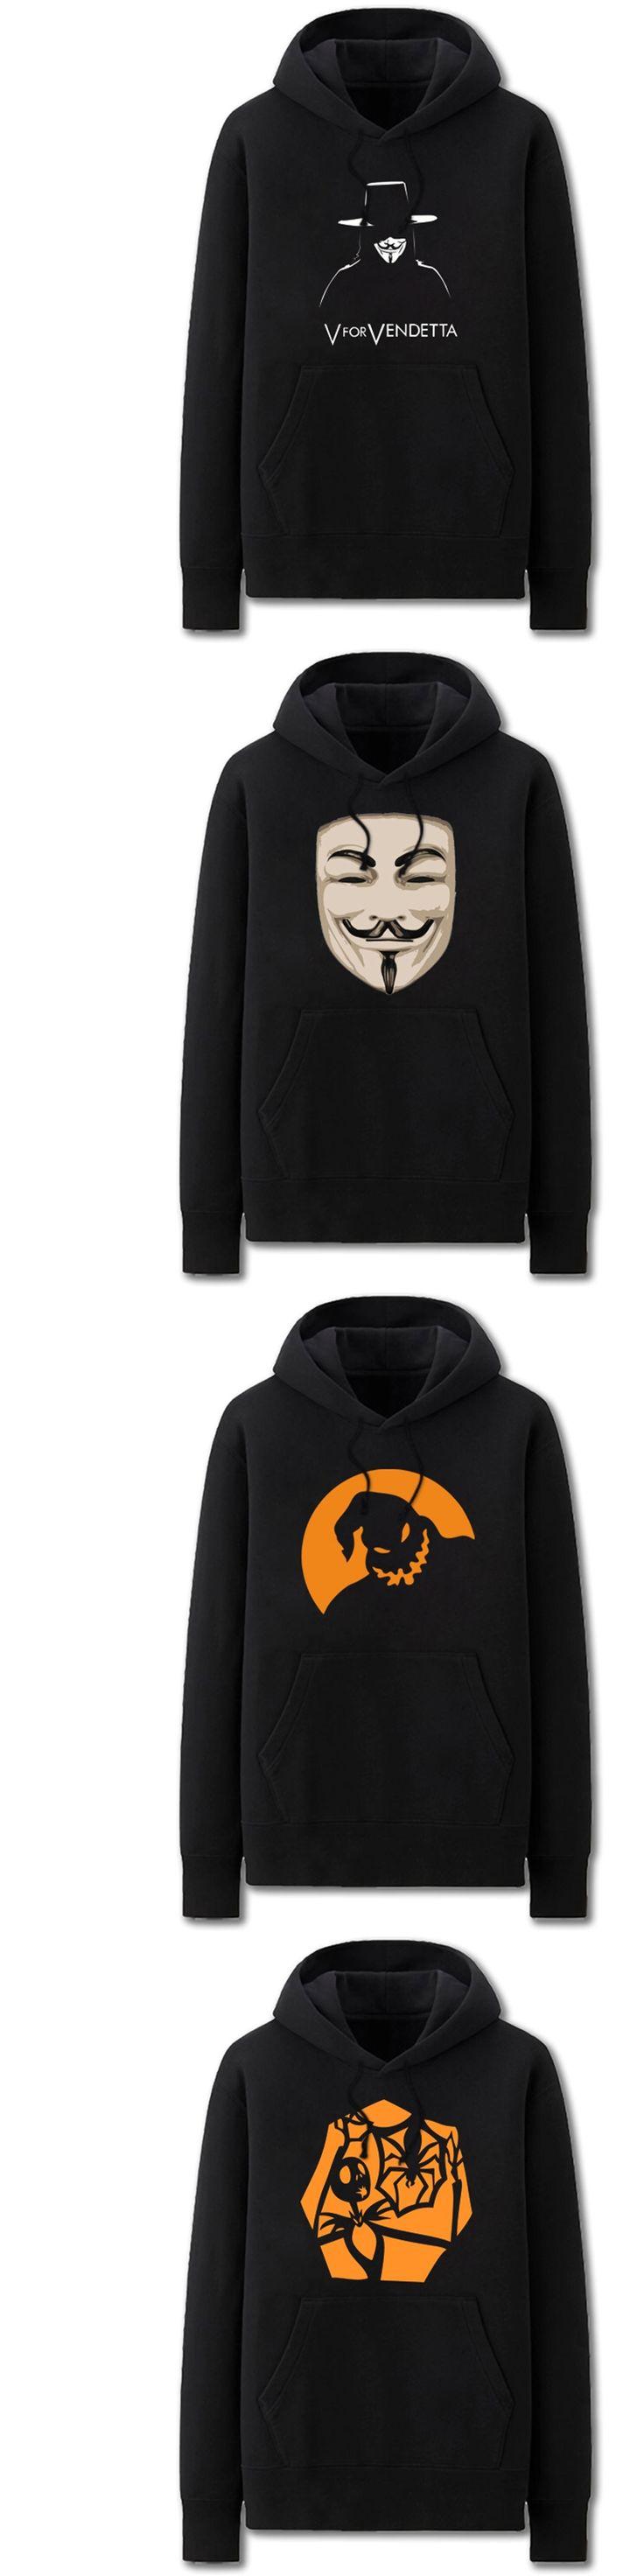 New Autumn Winter V For Vendetta print Hoodies Sweatshirts 2017 Men Women 100% Cotton Fashion Casual Cheap Tops Hoody Pullover